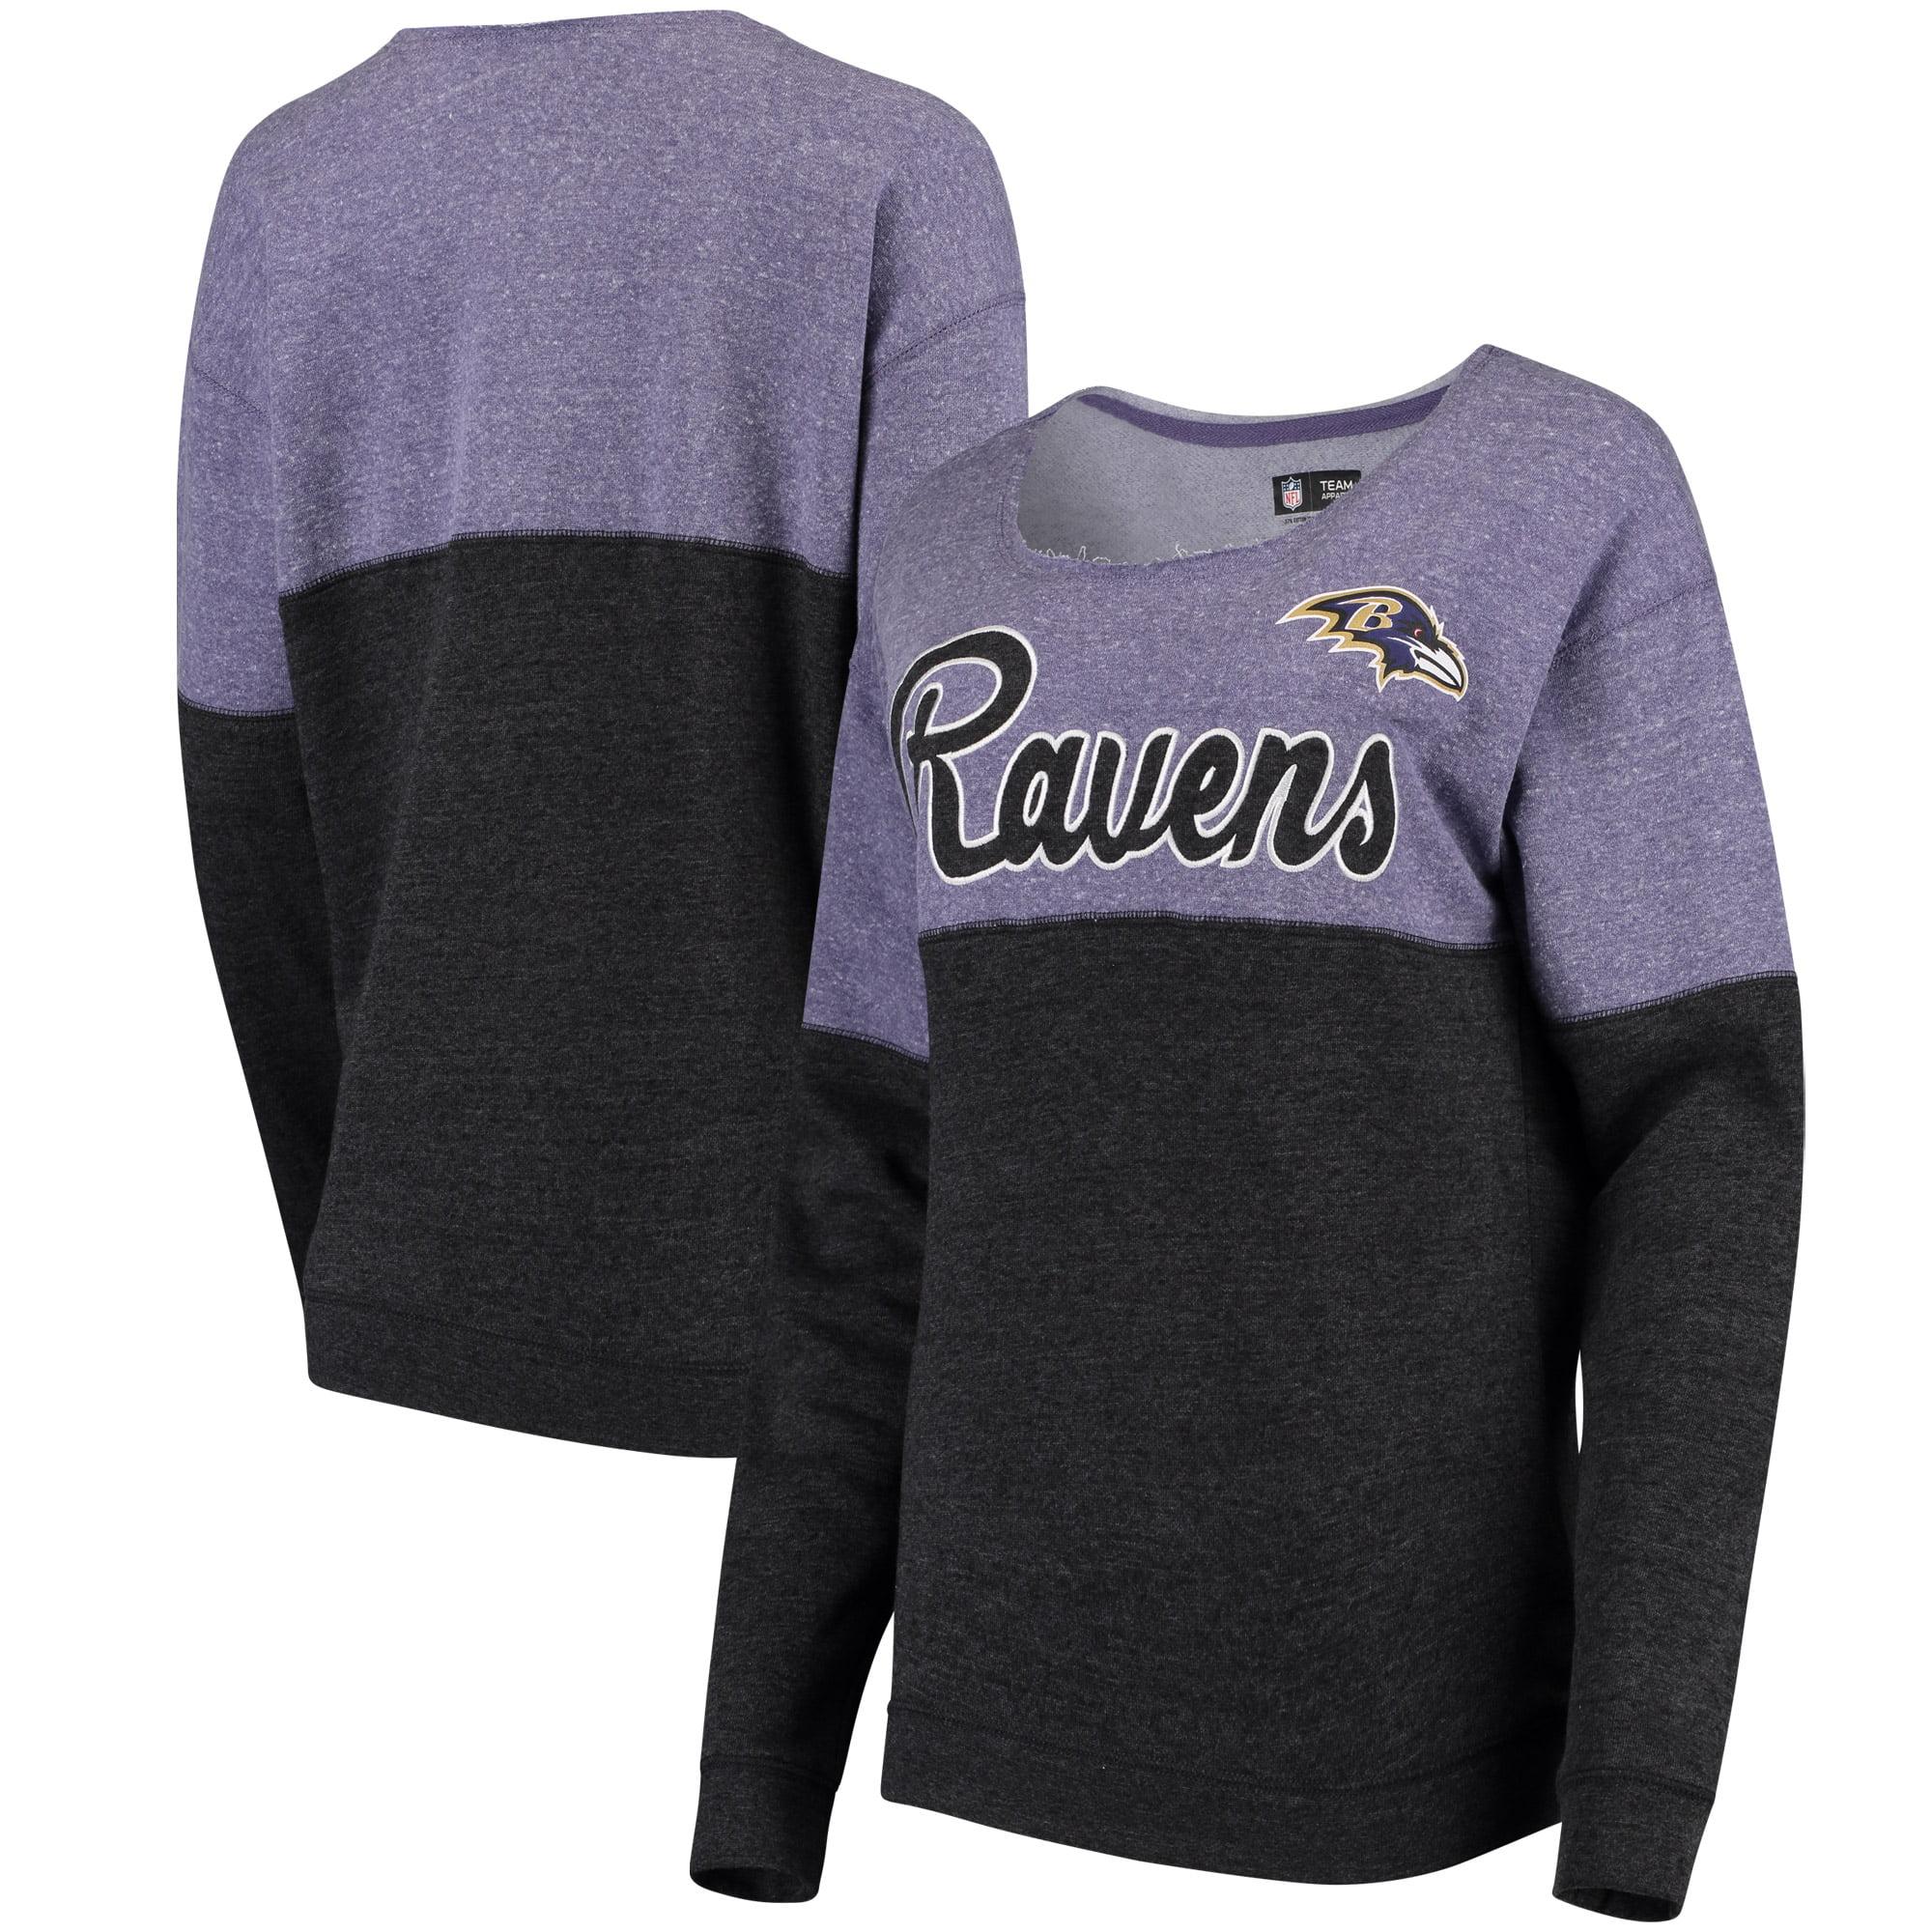 Baltimore Ravens 5th & Ocean by New Era Women's Fleece Tri-Blend Sweatshirt - Purple/Black - M